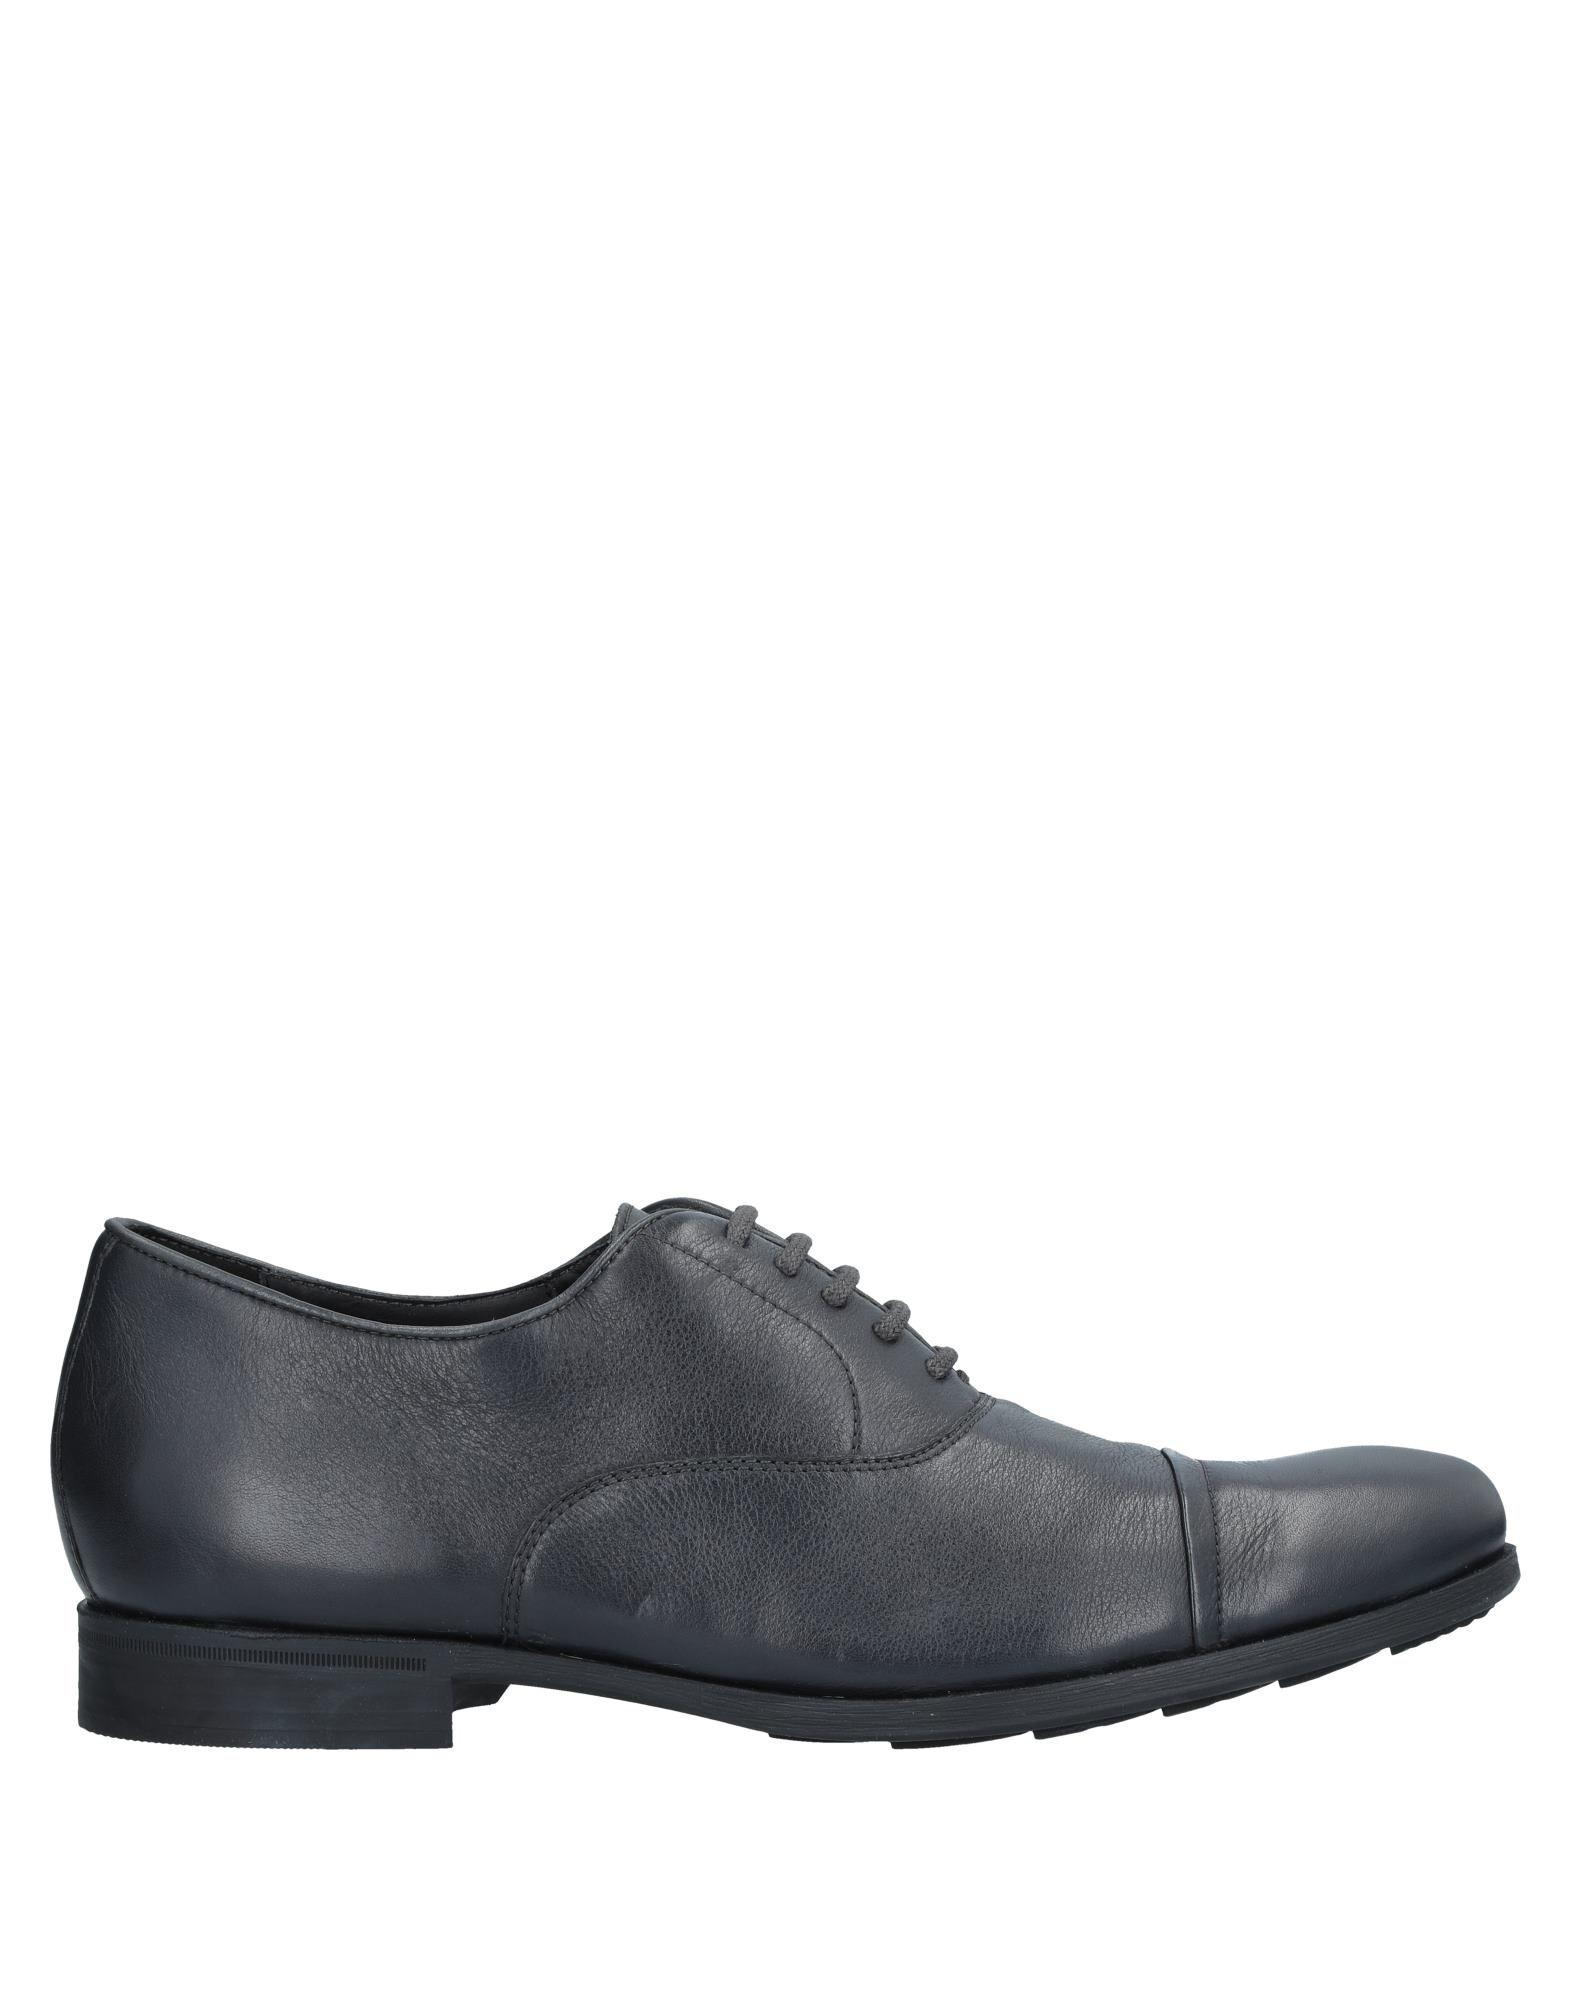 ФОТО geox Обувь на шнурках